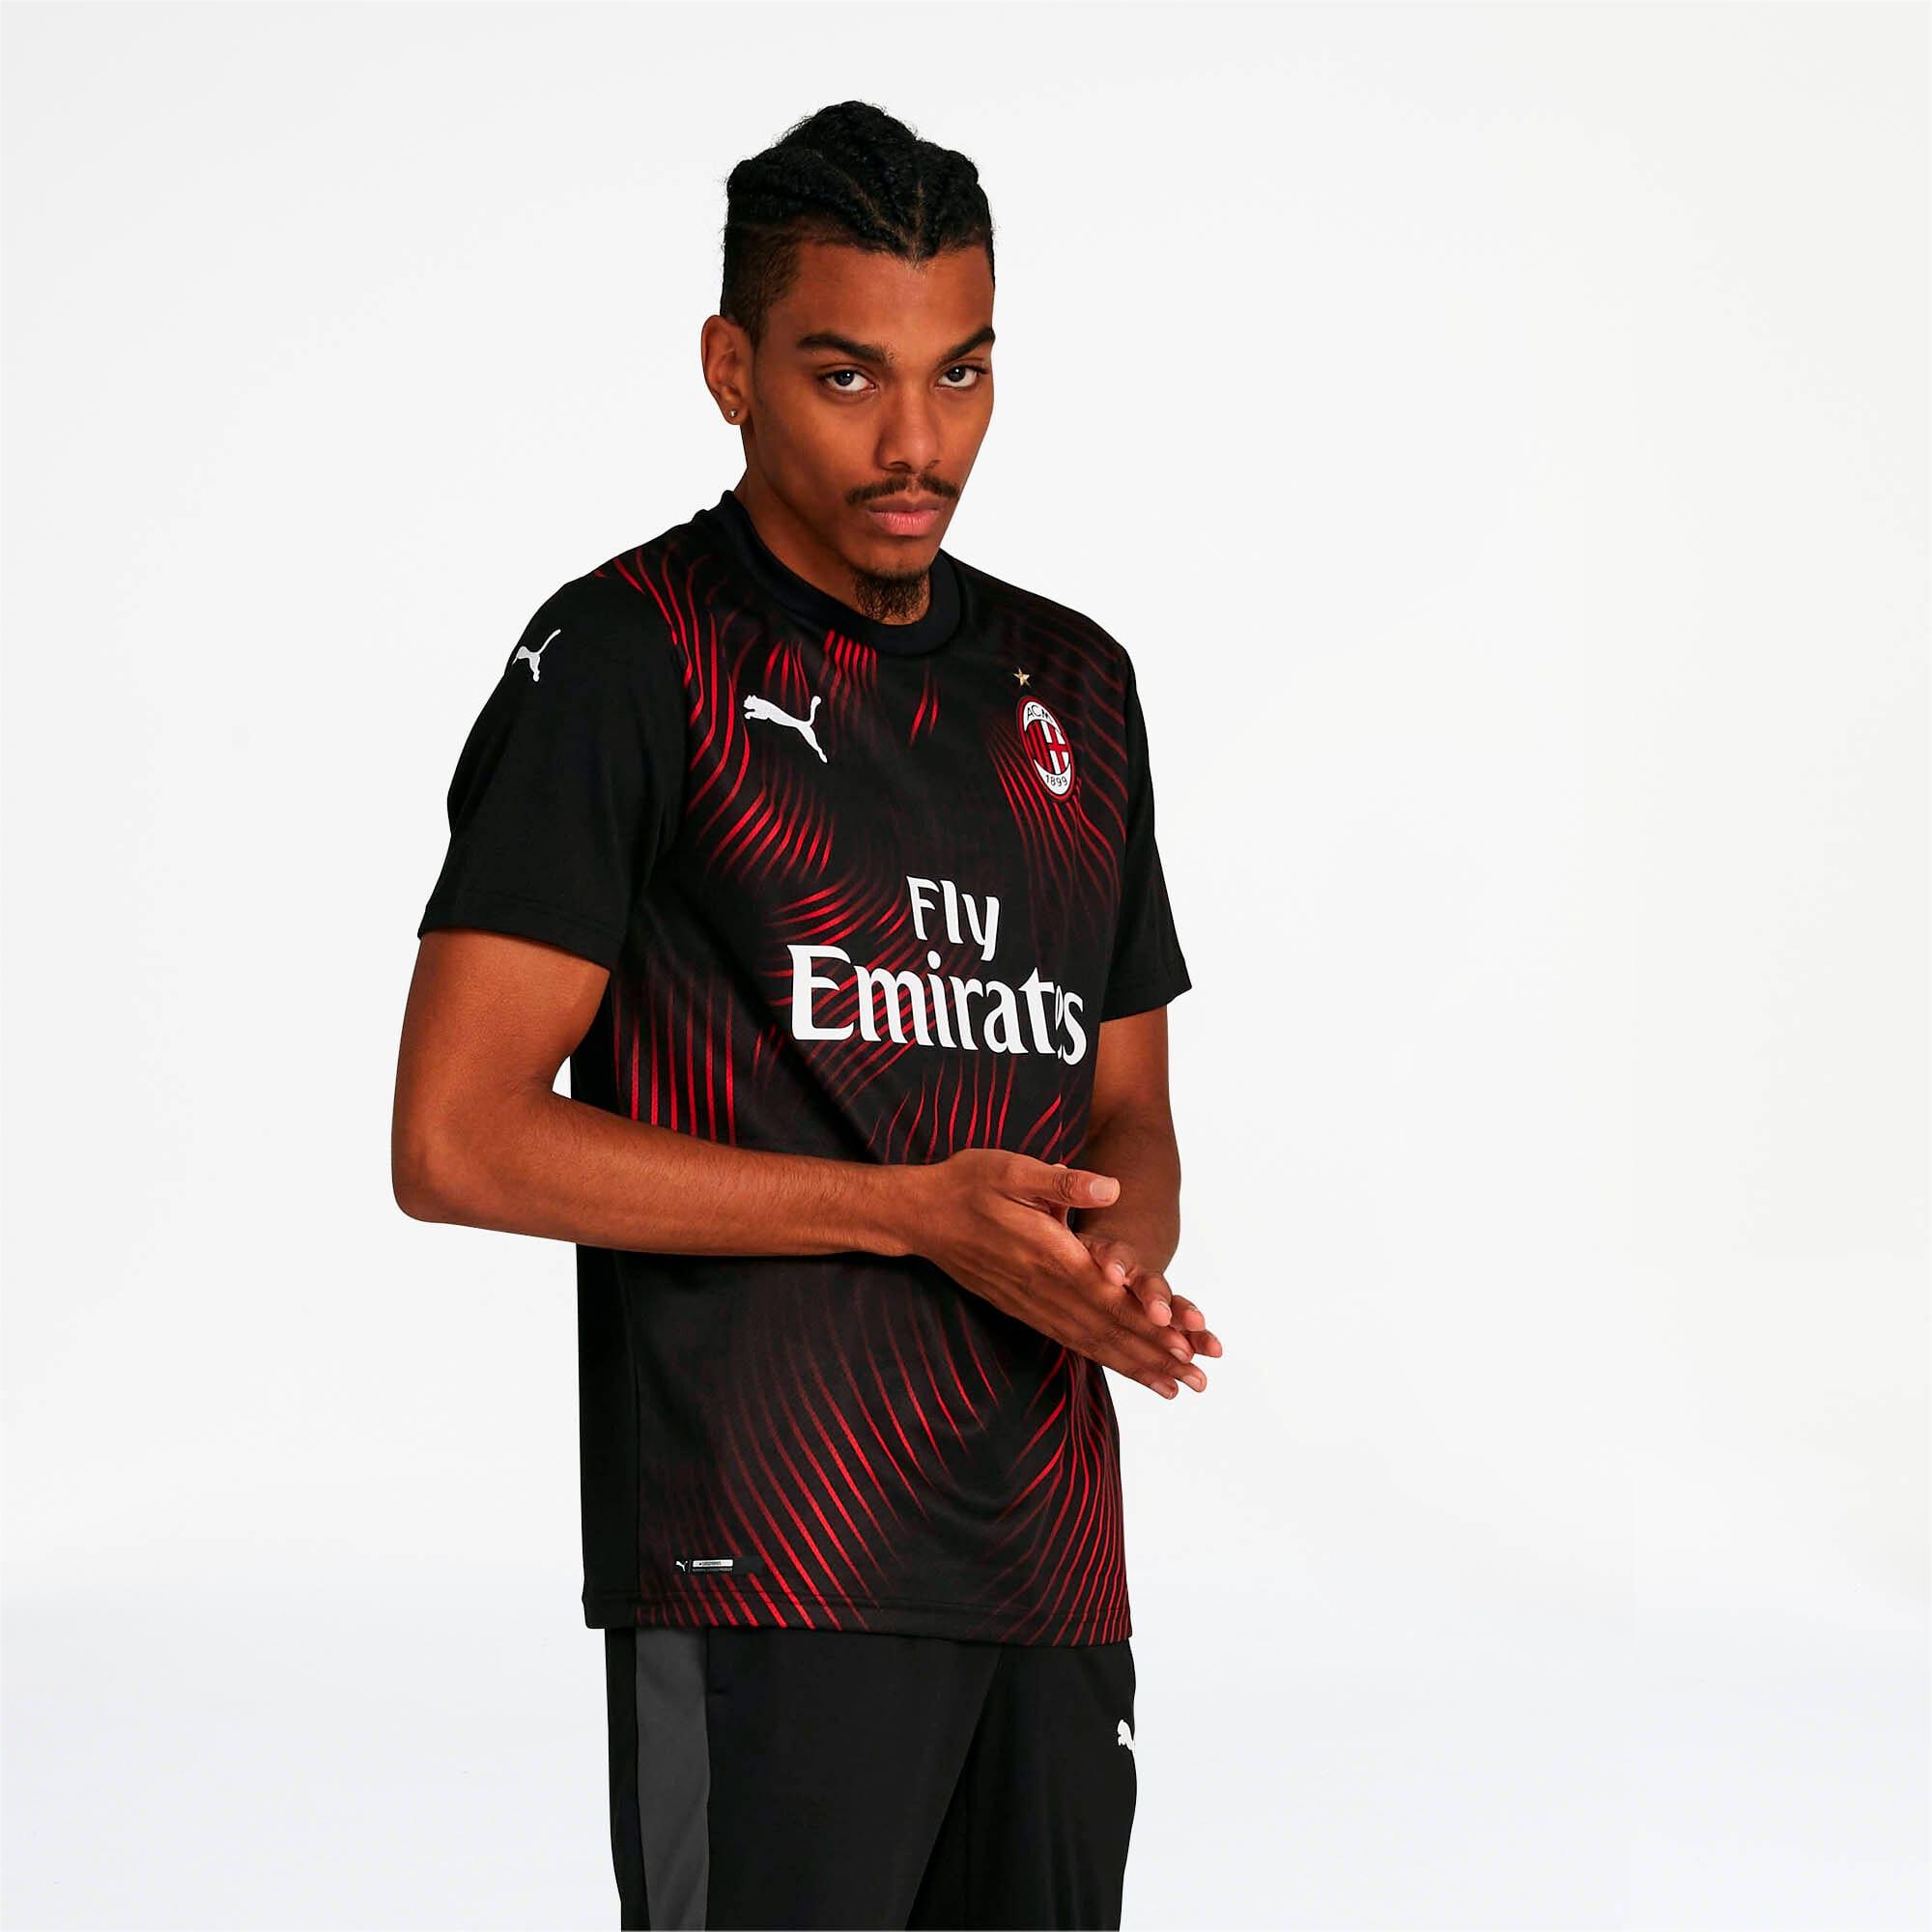 Thumbnail 1 of AC Milan Men's Third Replica Jersey, Puma Black-Tango Red, medium